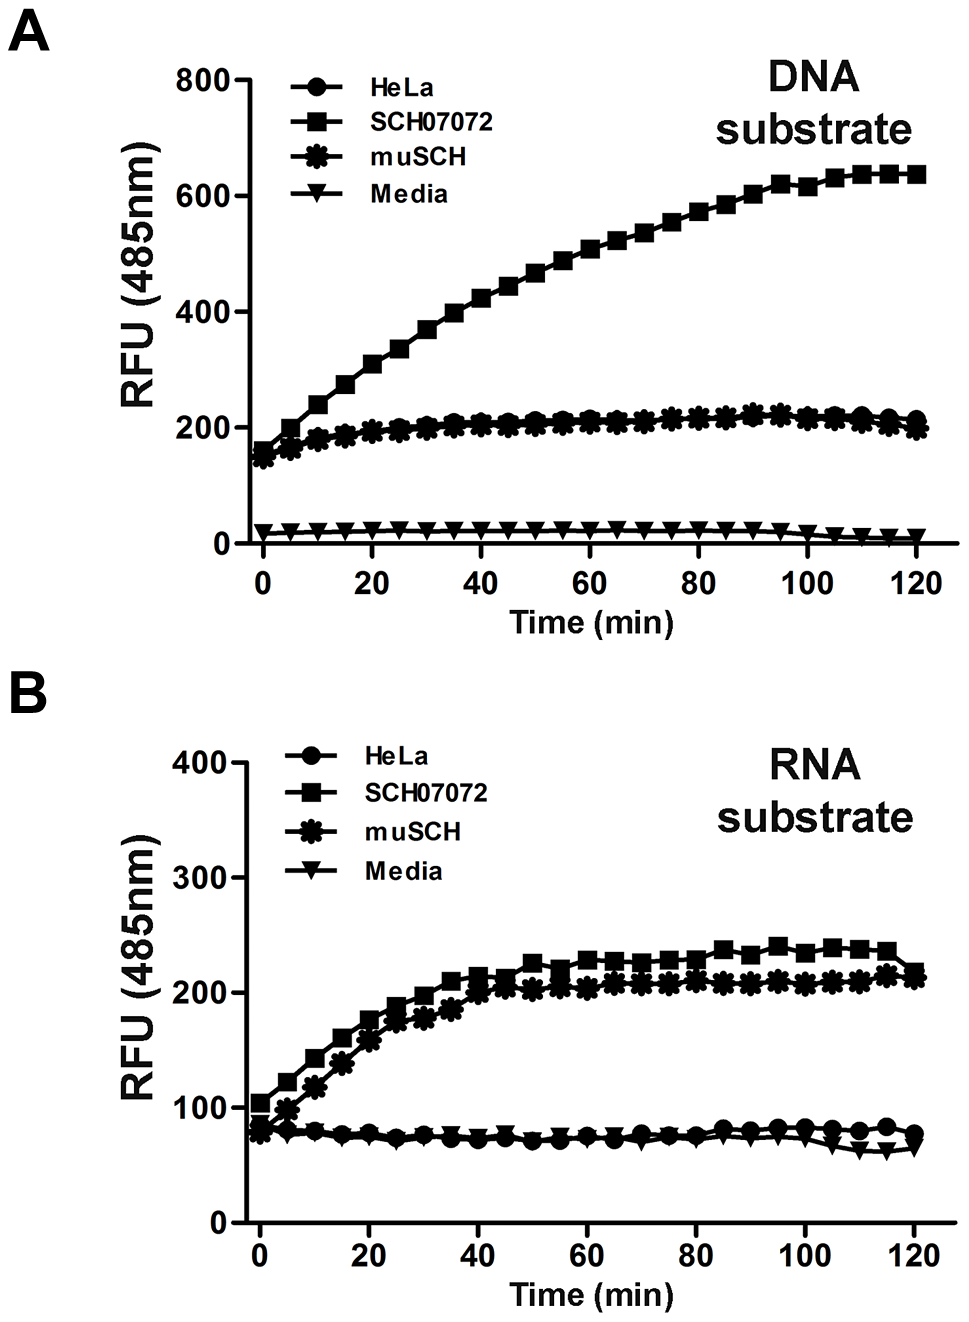 3D8 scFv protein have DNase and RNase activity <i>in vitro</i> (FRET assay).